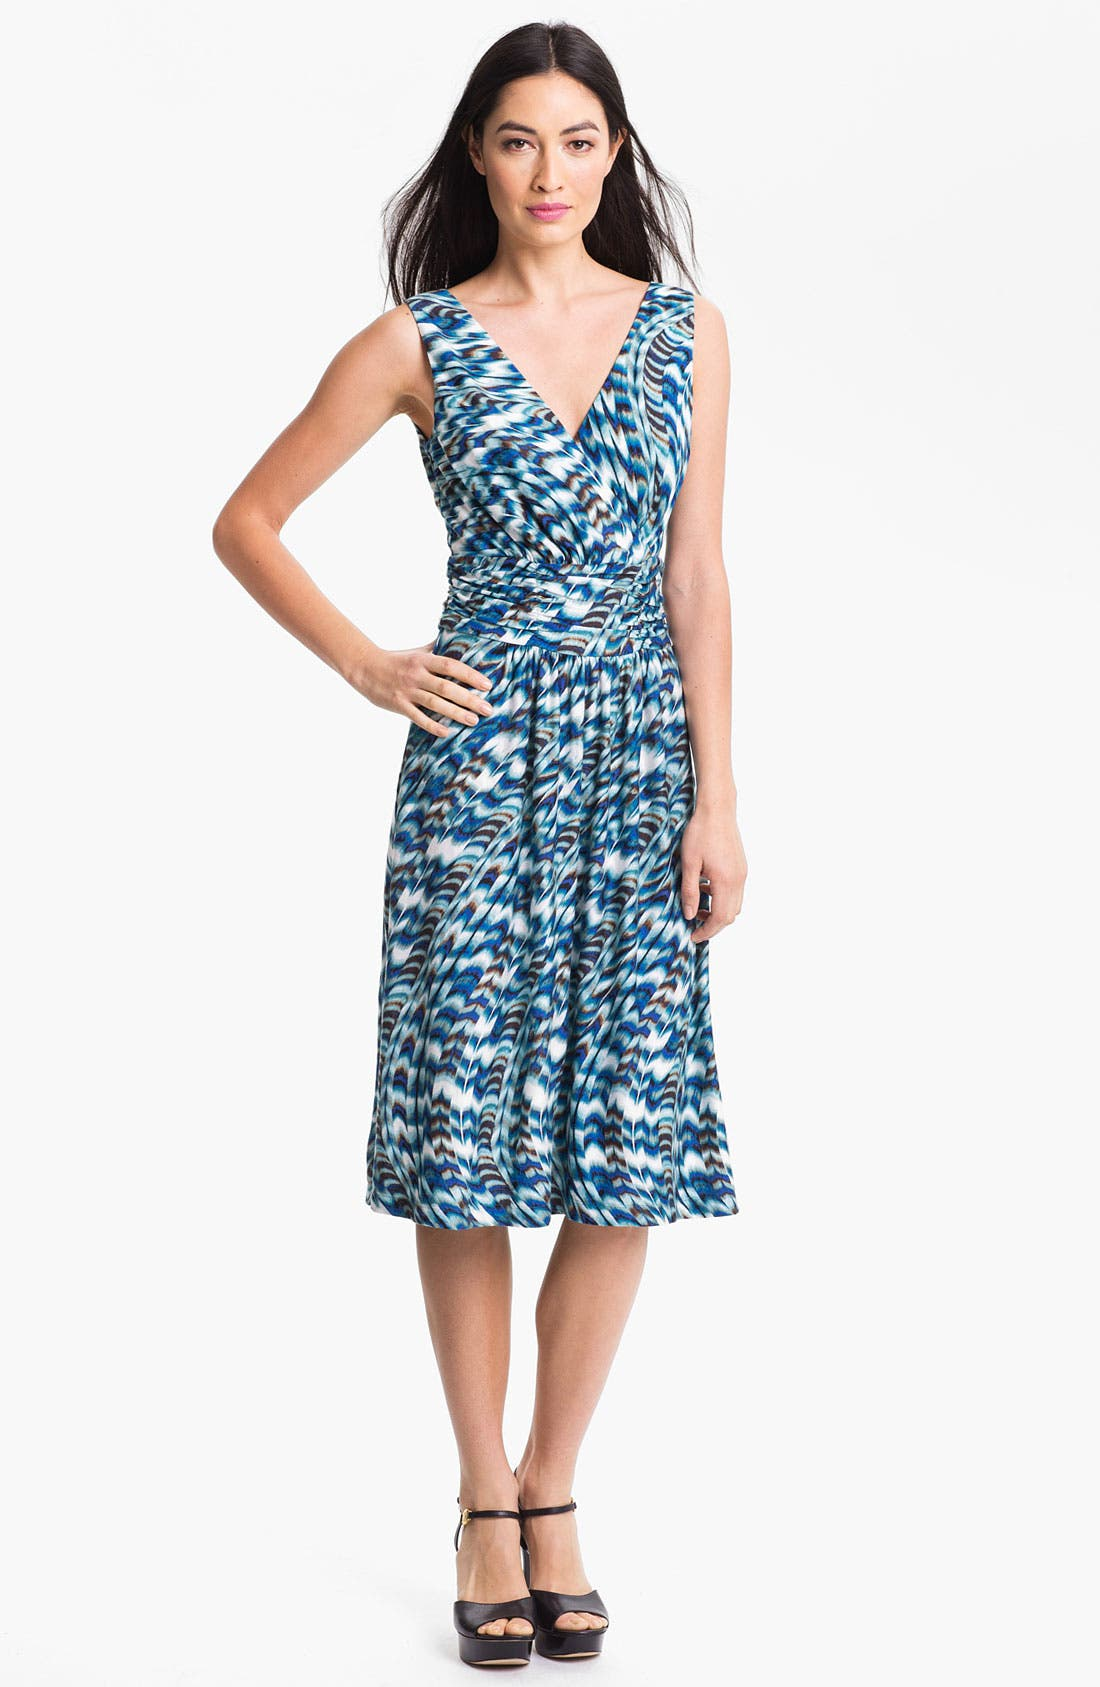 Alternate Image 1 Selected - Nic + Zoe 'Spring Skies' Dress